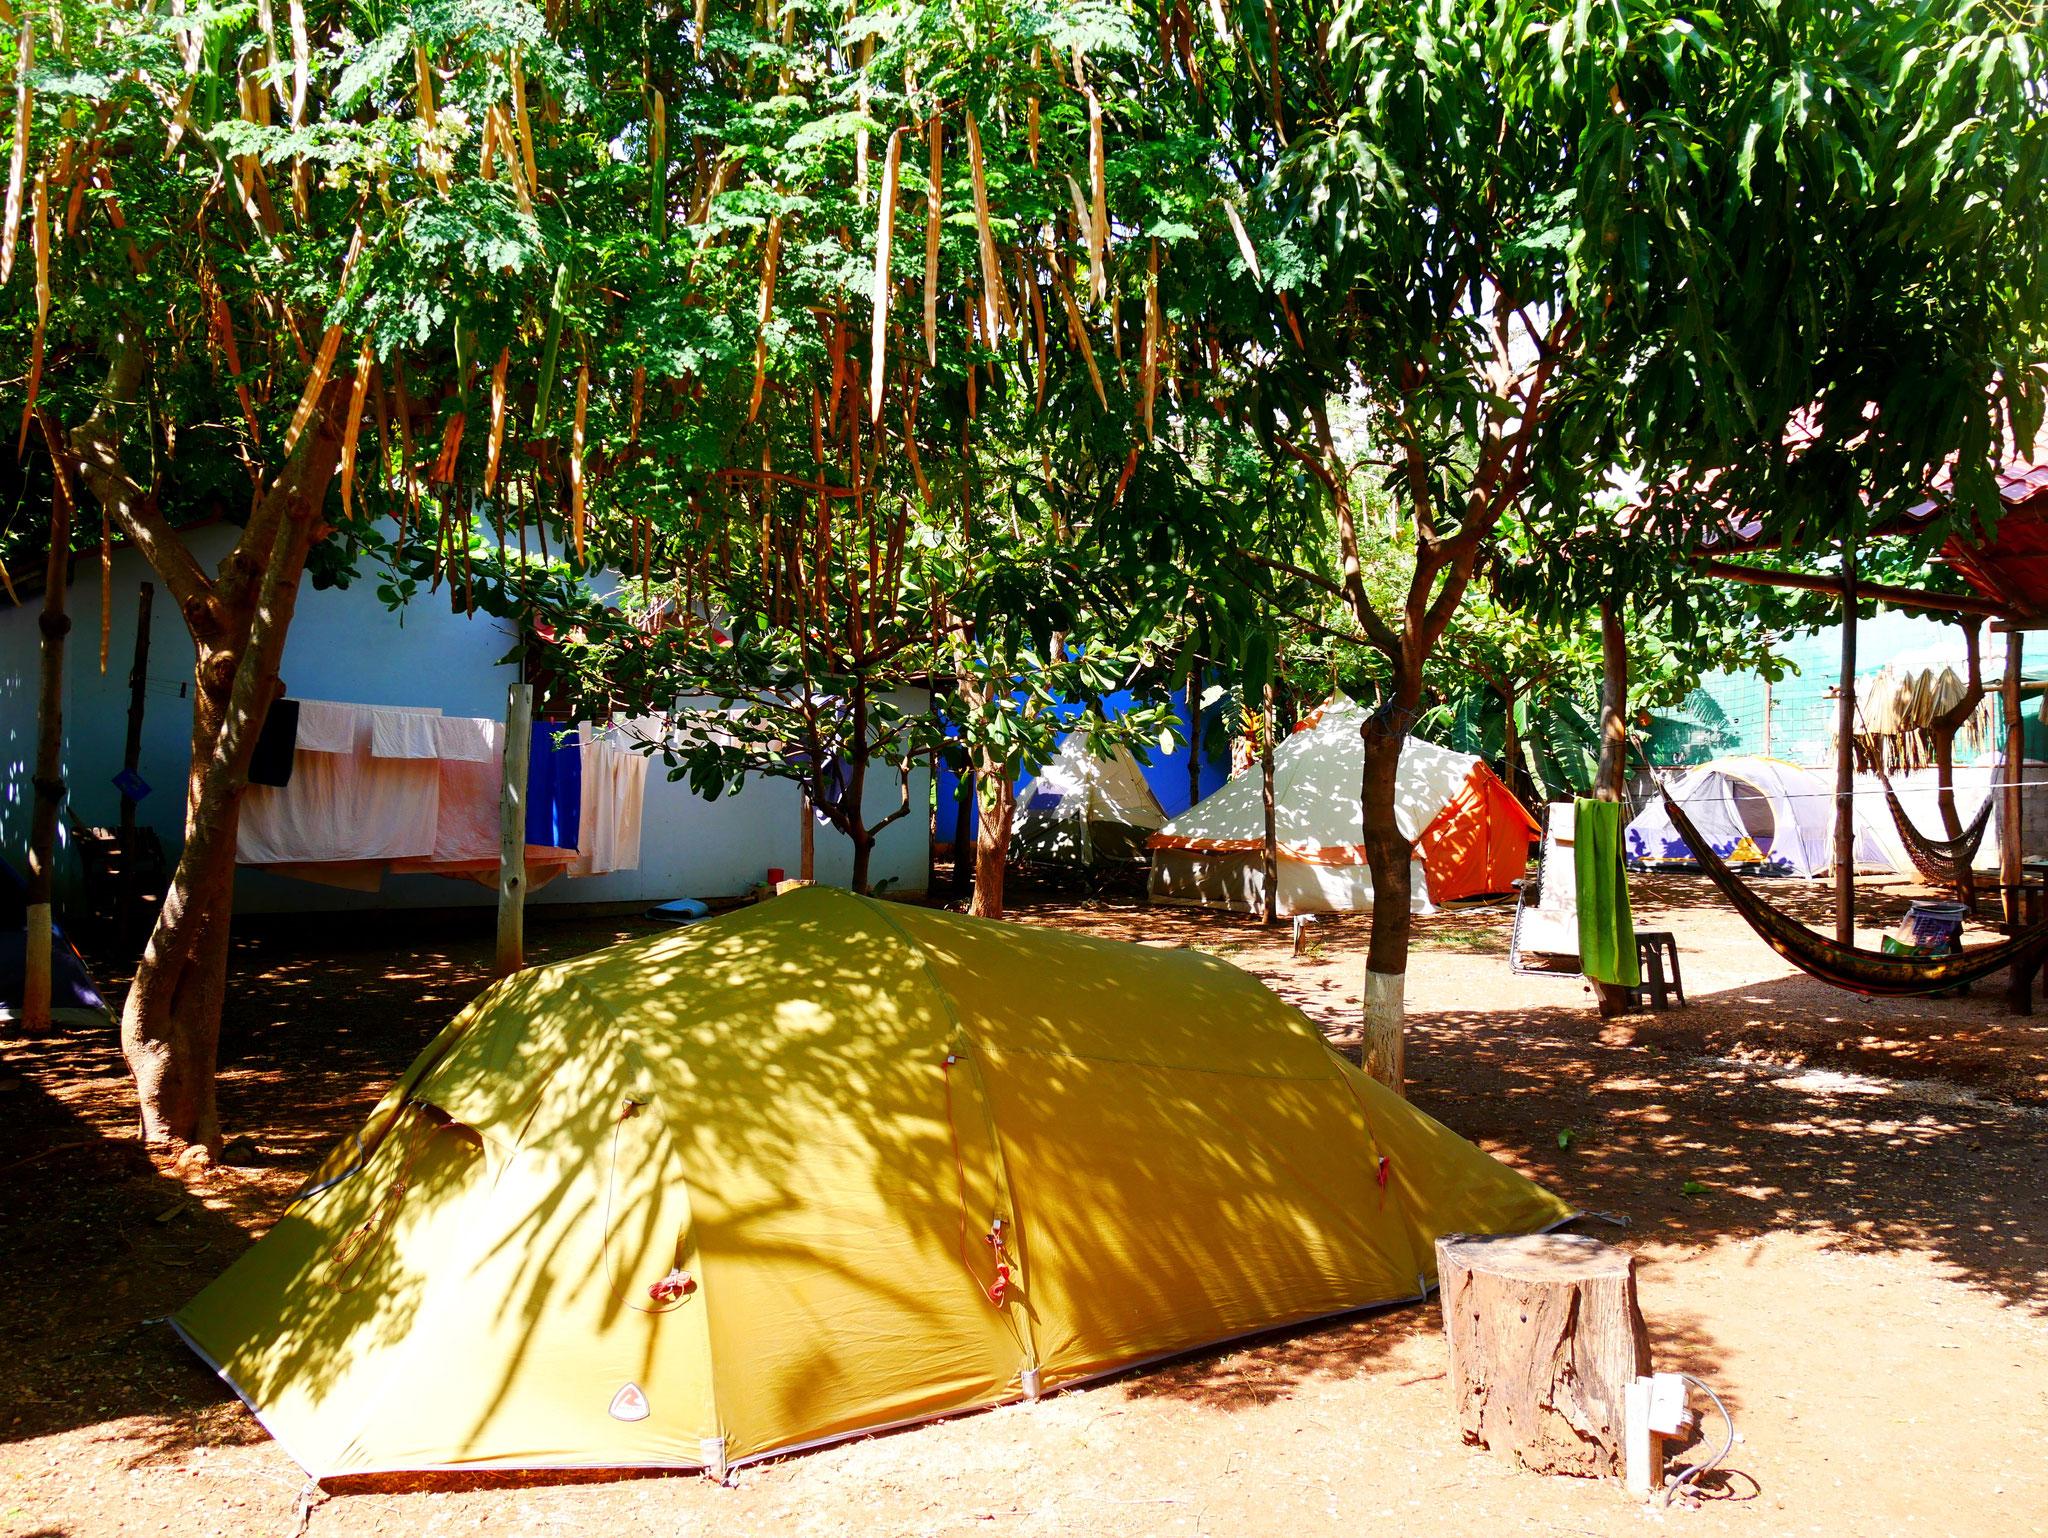 Camping in Tamarindo